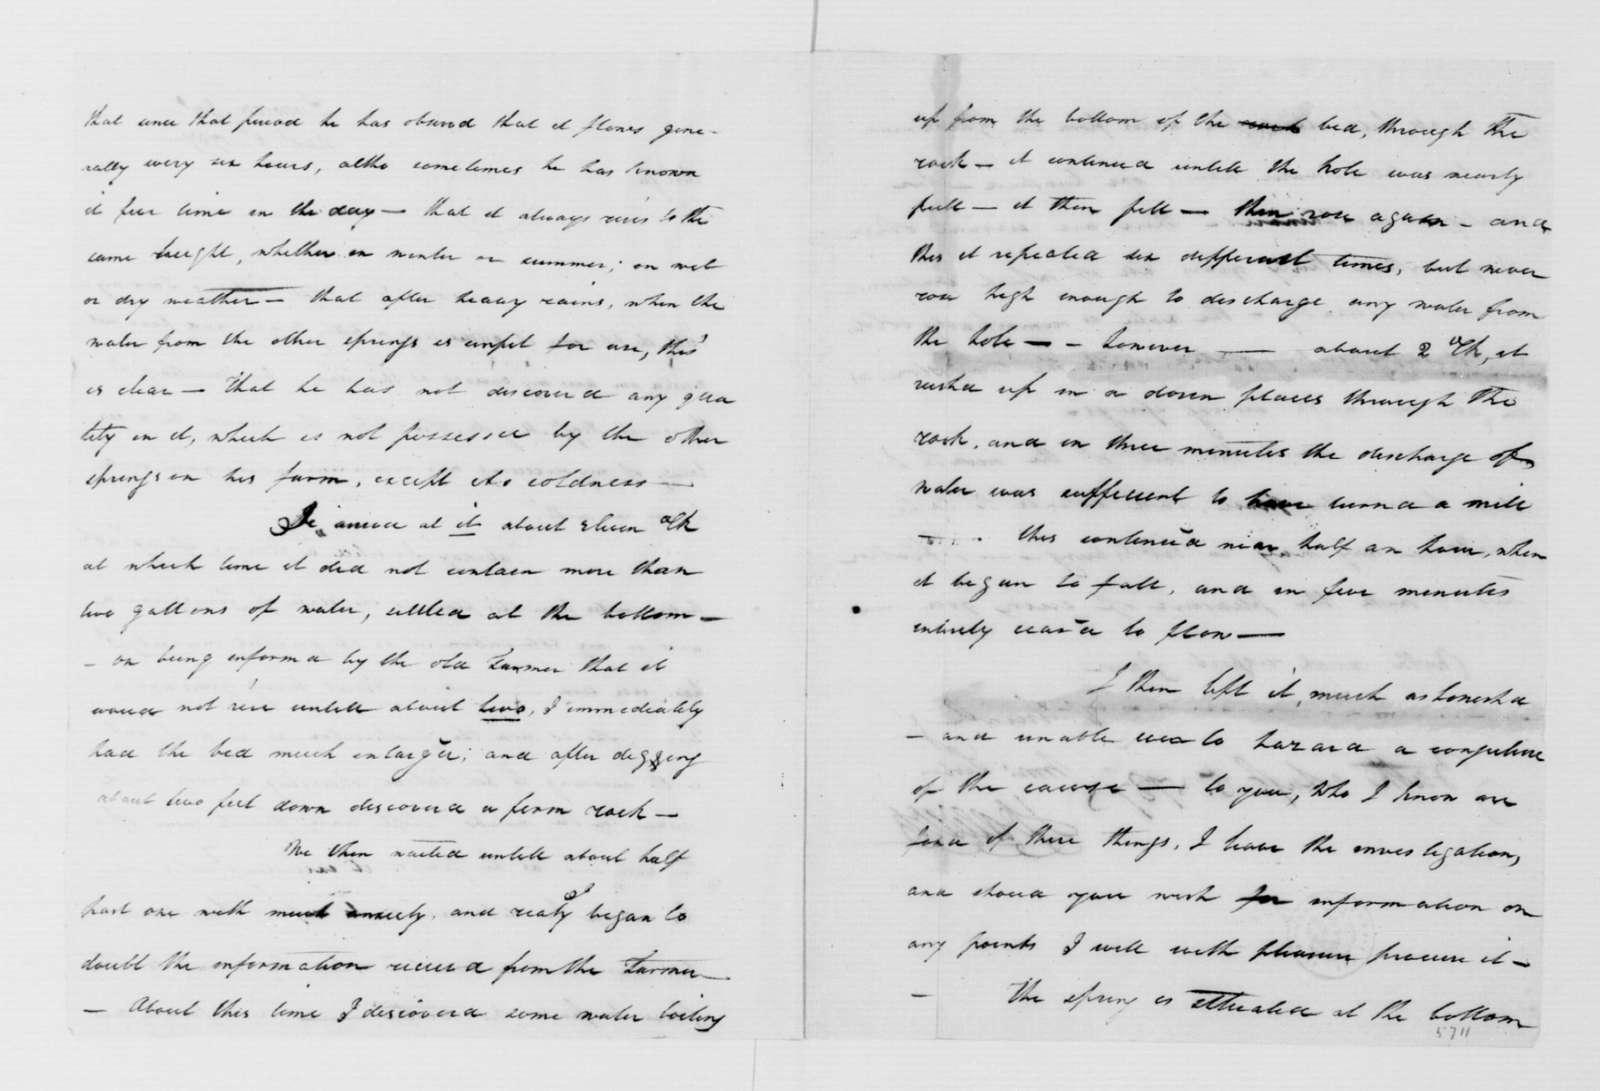 John Dawson to James Madison, August 5, 1787.